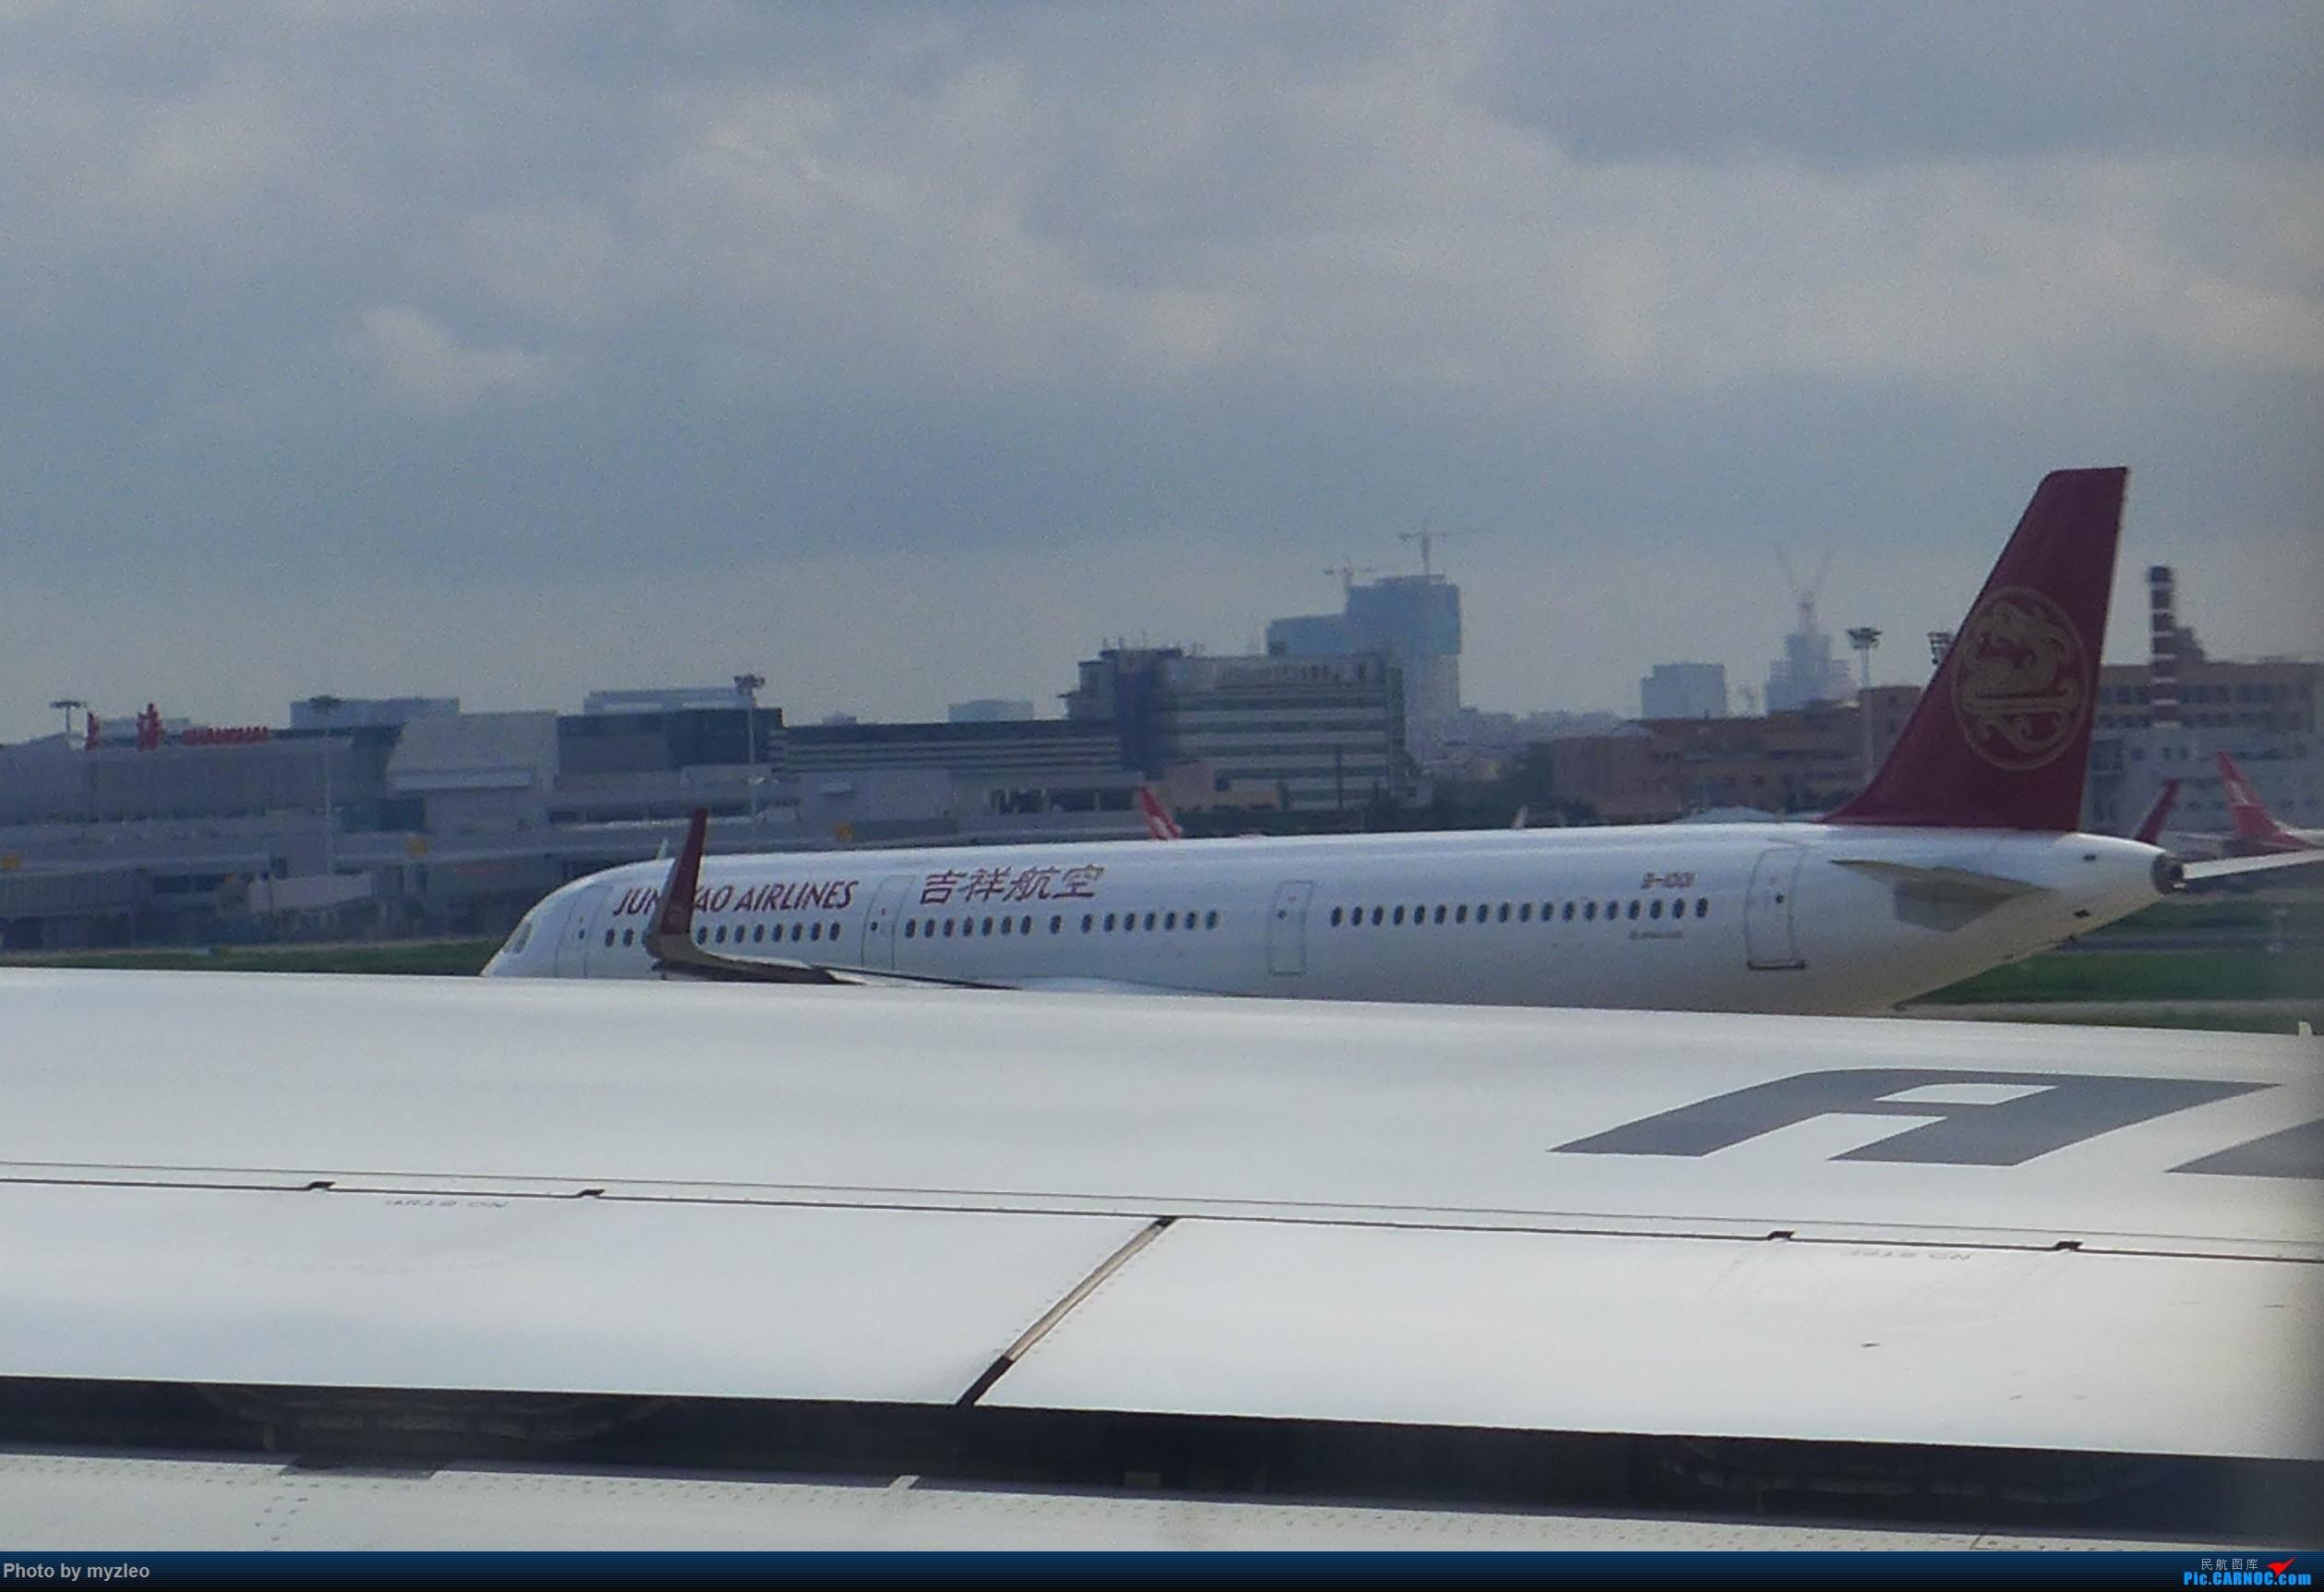 Re:[原创]【myzleo的游记3.1】三访帝都——记一次意外的惊喜,大鹅头初遇,第一次去中关村 AIRBUS A321-200 B-1001 中国上海虹桥国际机场